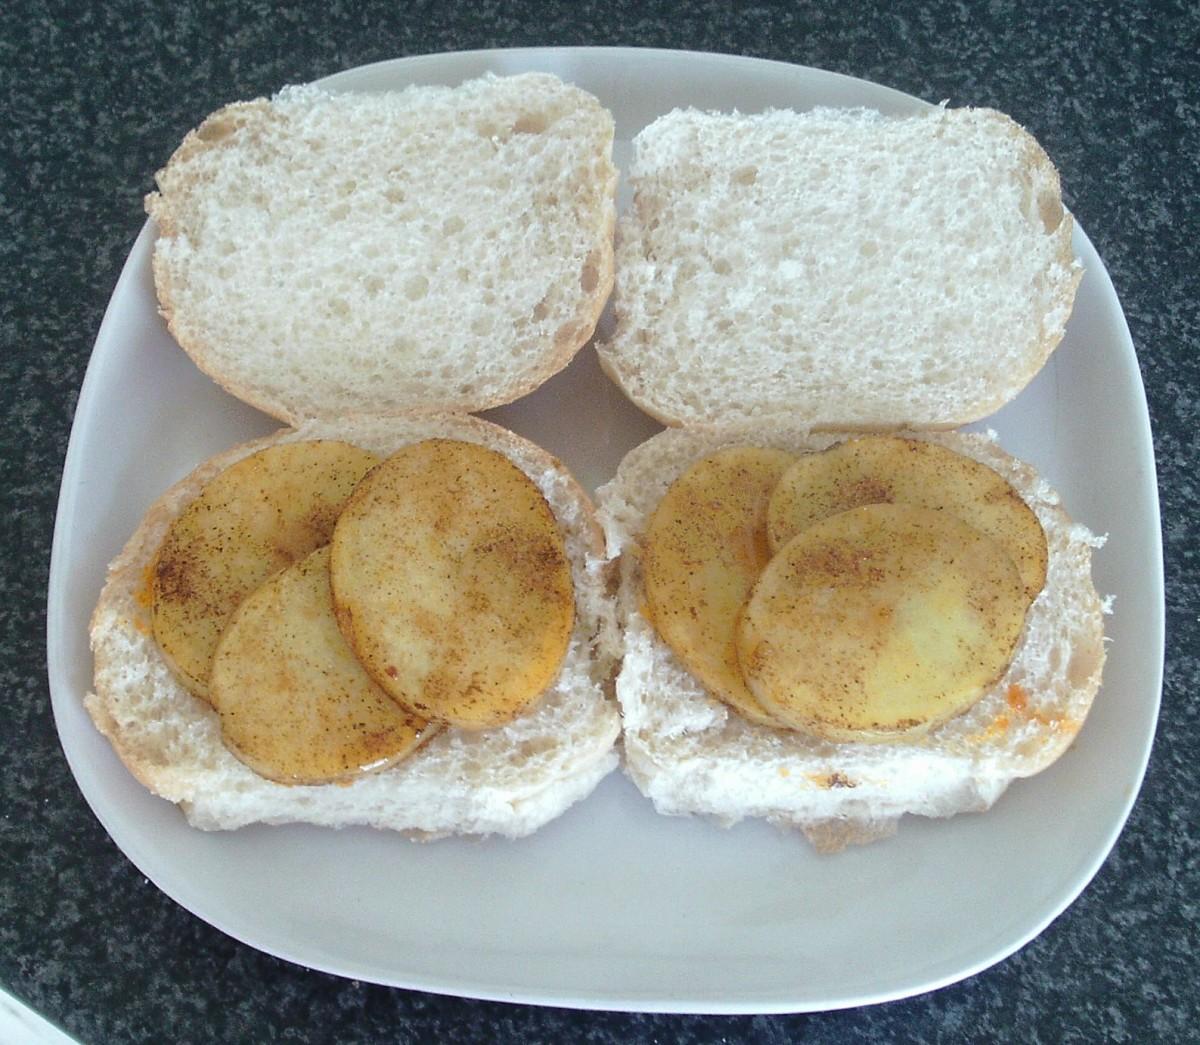 Fried potatoes on rolls